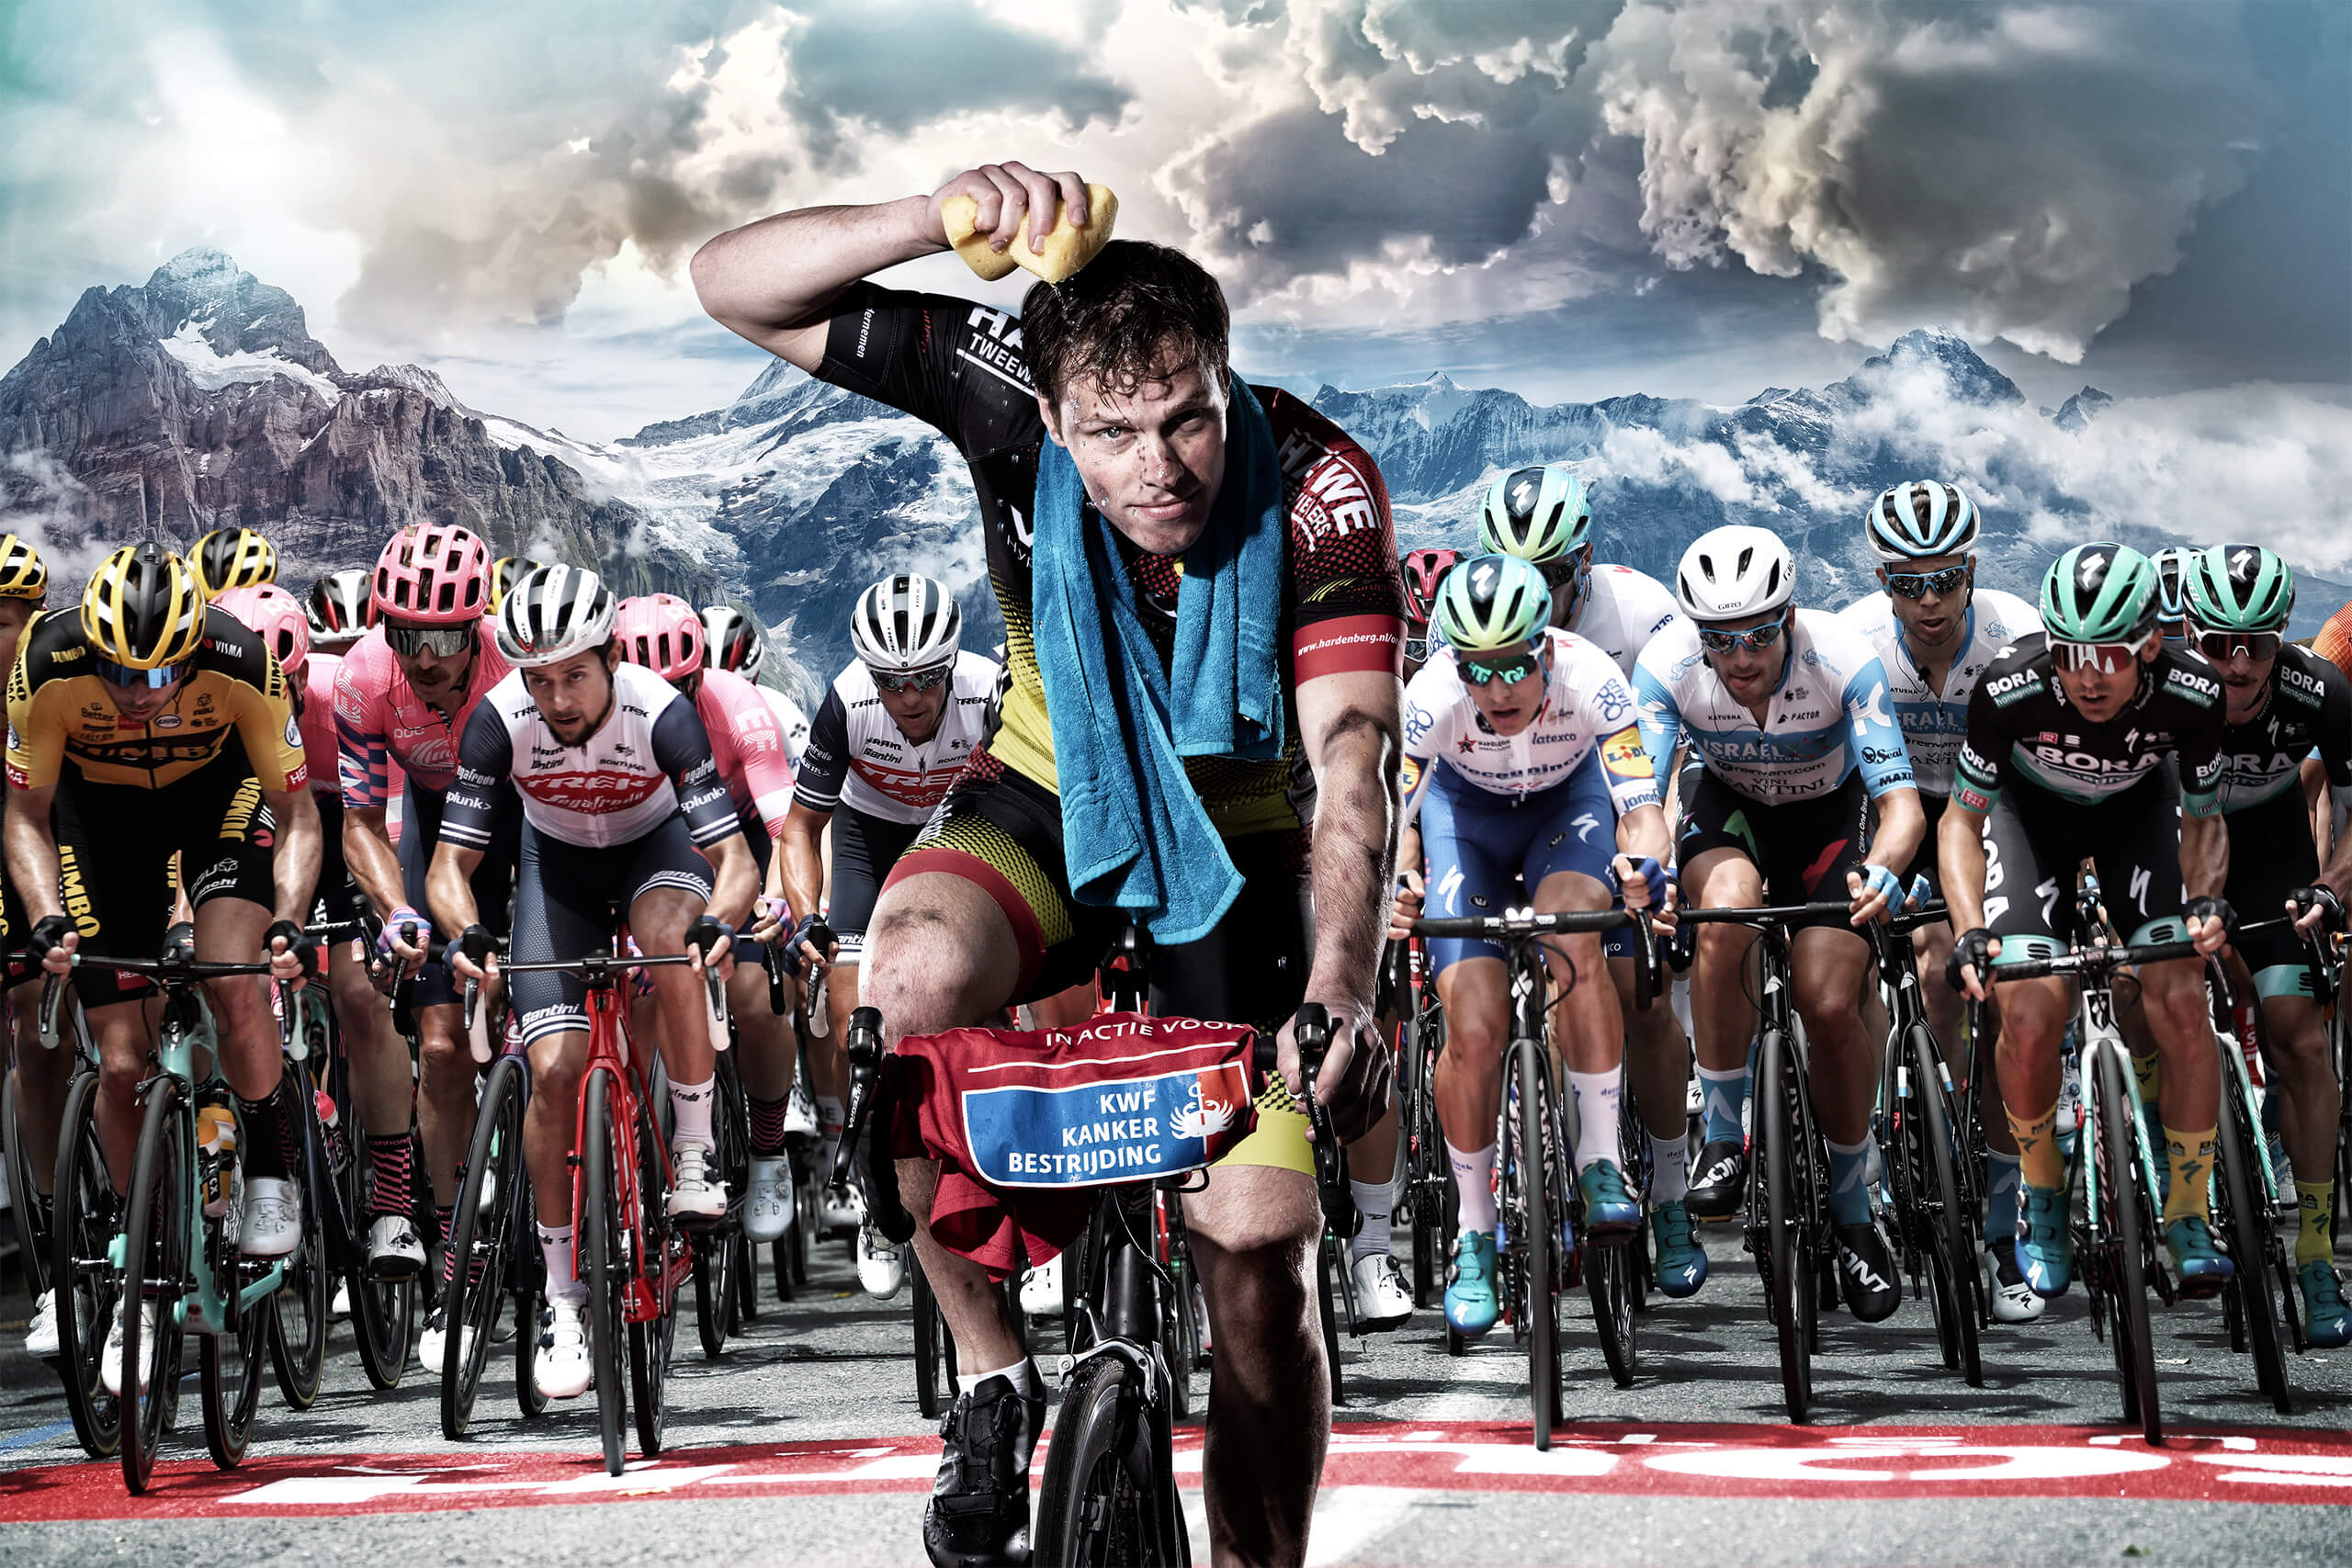 KWF kankerbestrijding Alpe d'huzes frankrijk tocht fietsen